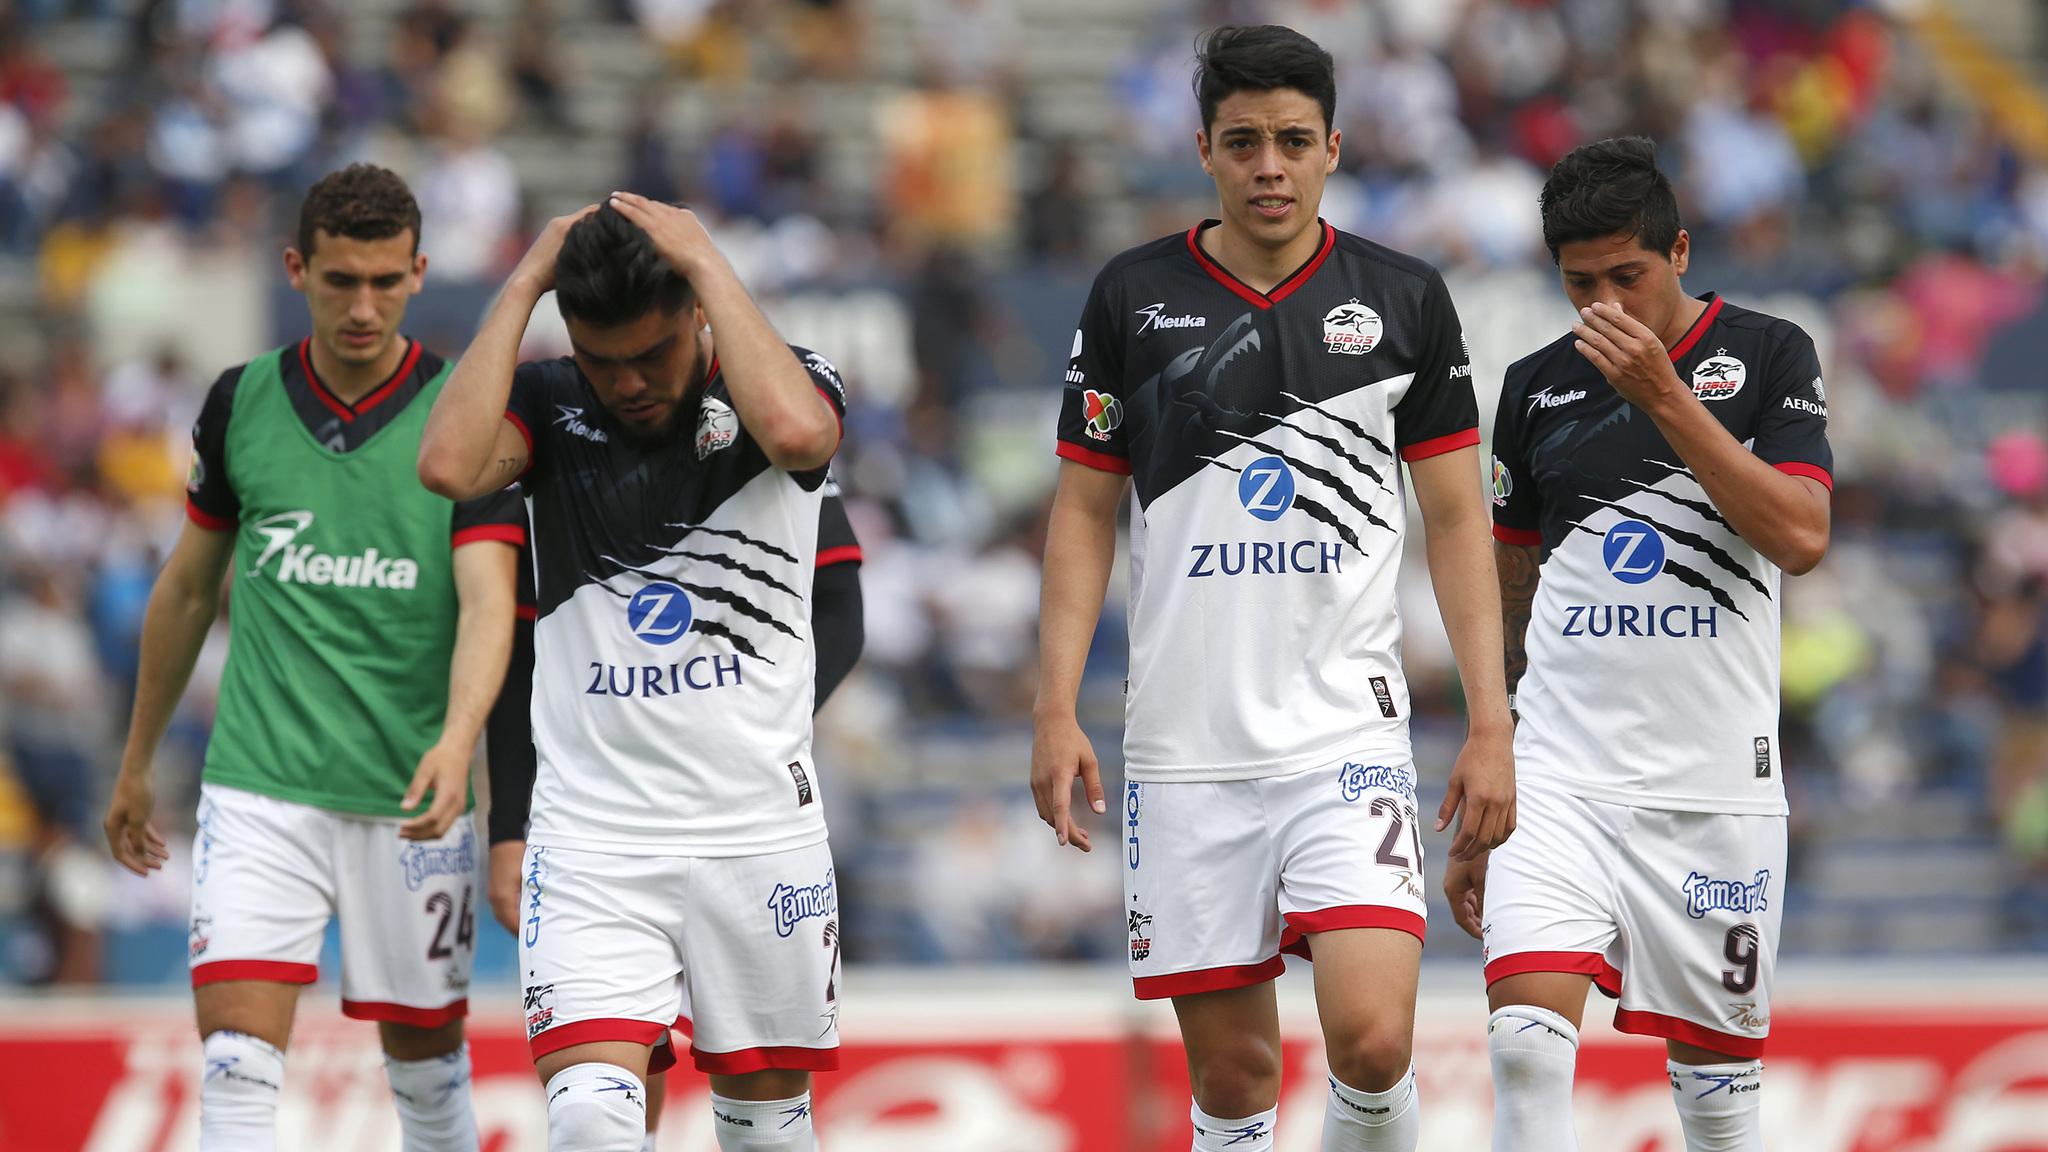 Subasta Liga MX Lobos BUAP Celaya Toros Ascenso